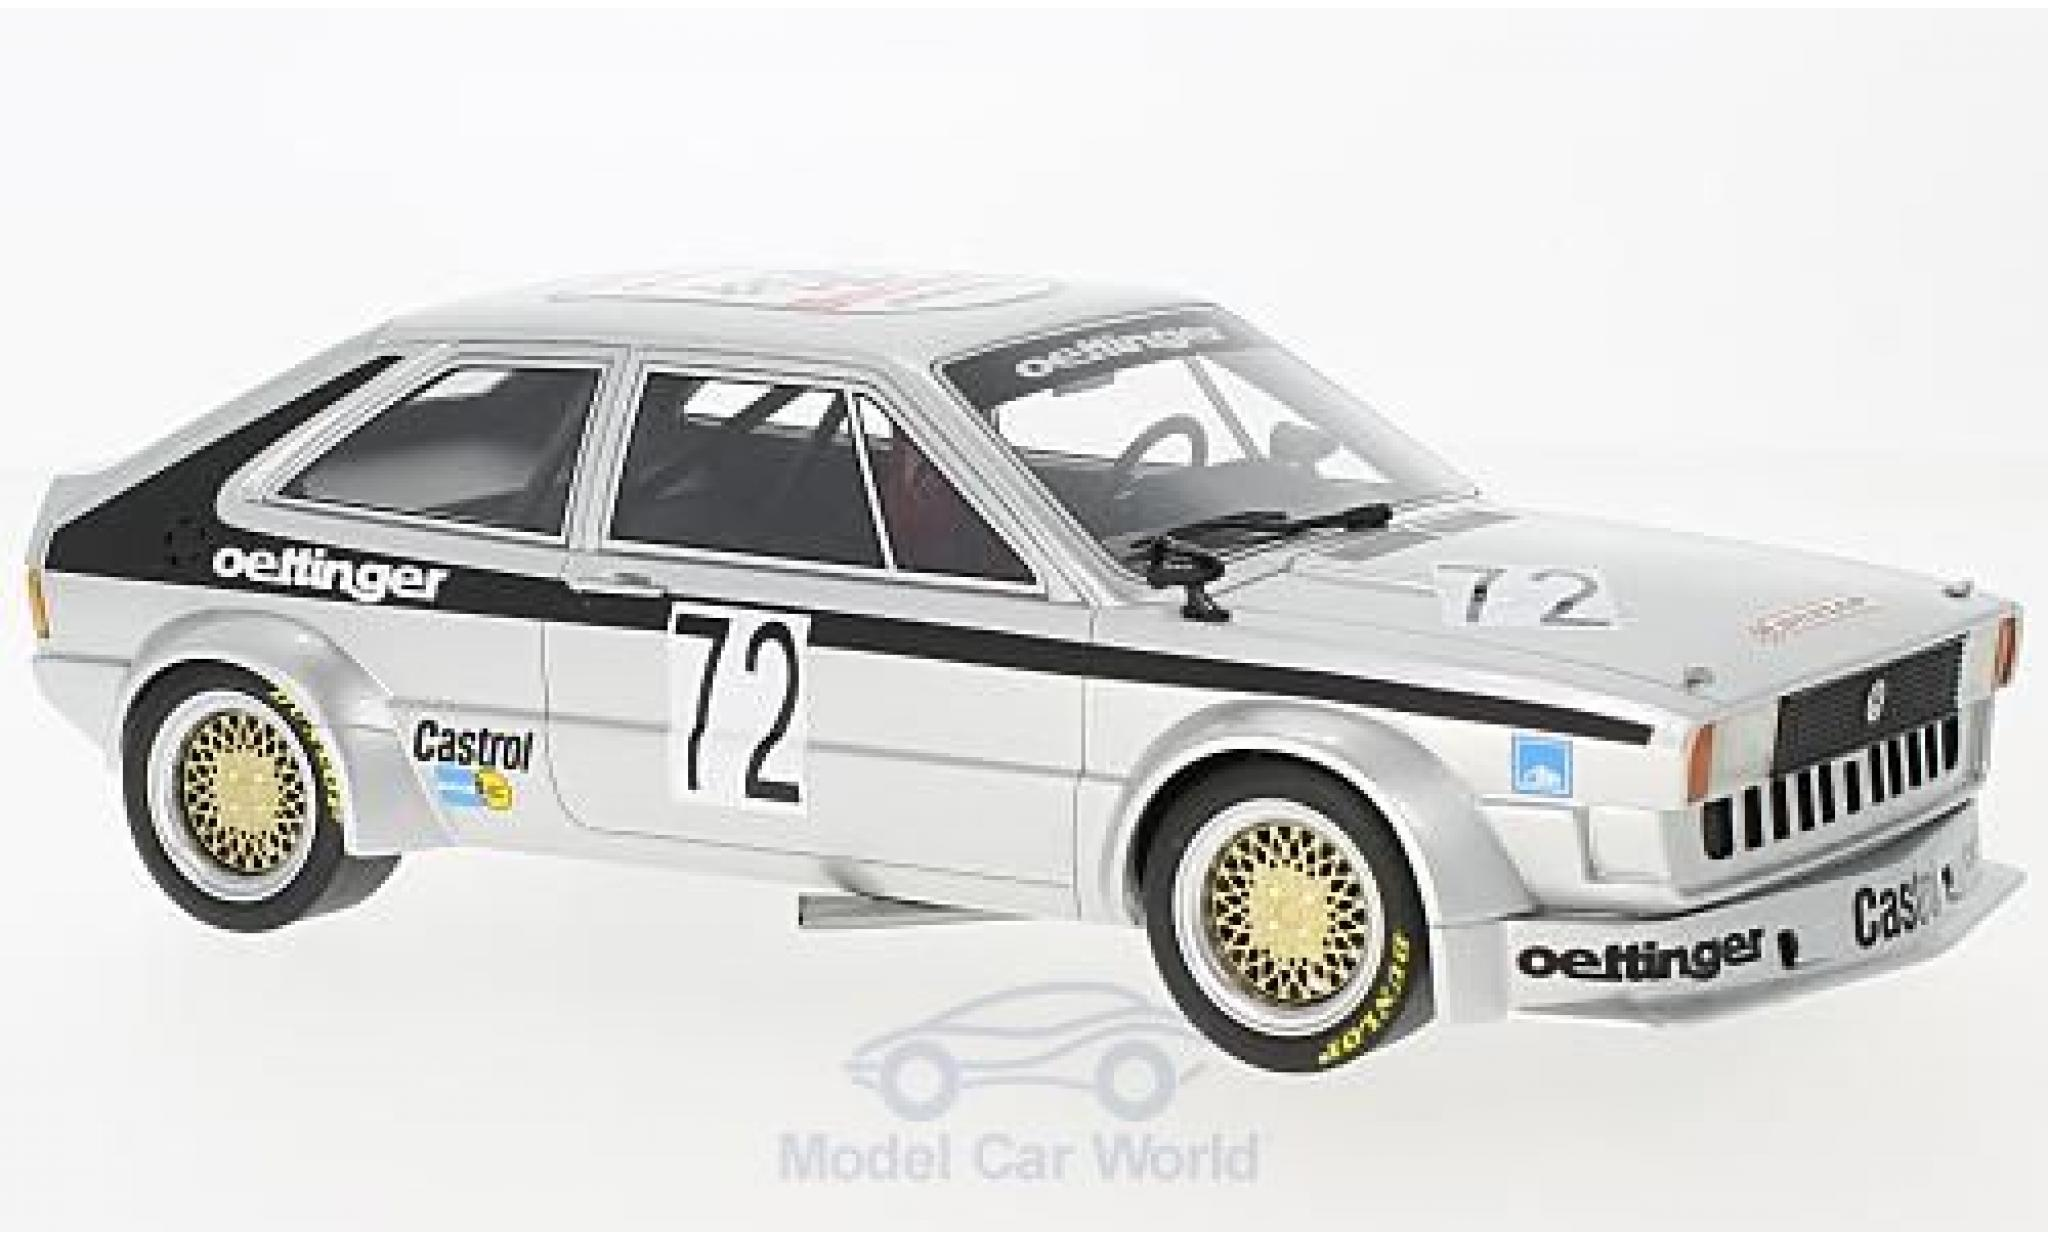 Volkswagen Scirocco 1/18 BoS Models Gr. 2 No.72 Oettinger 1975